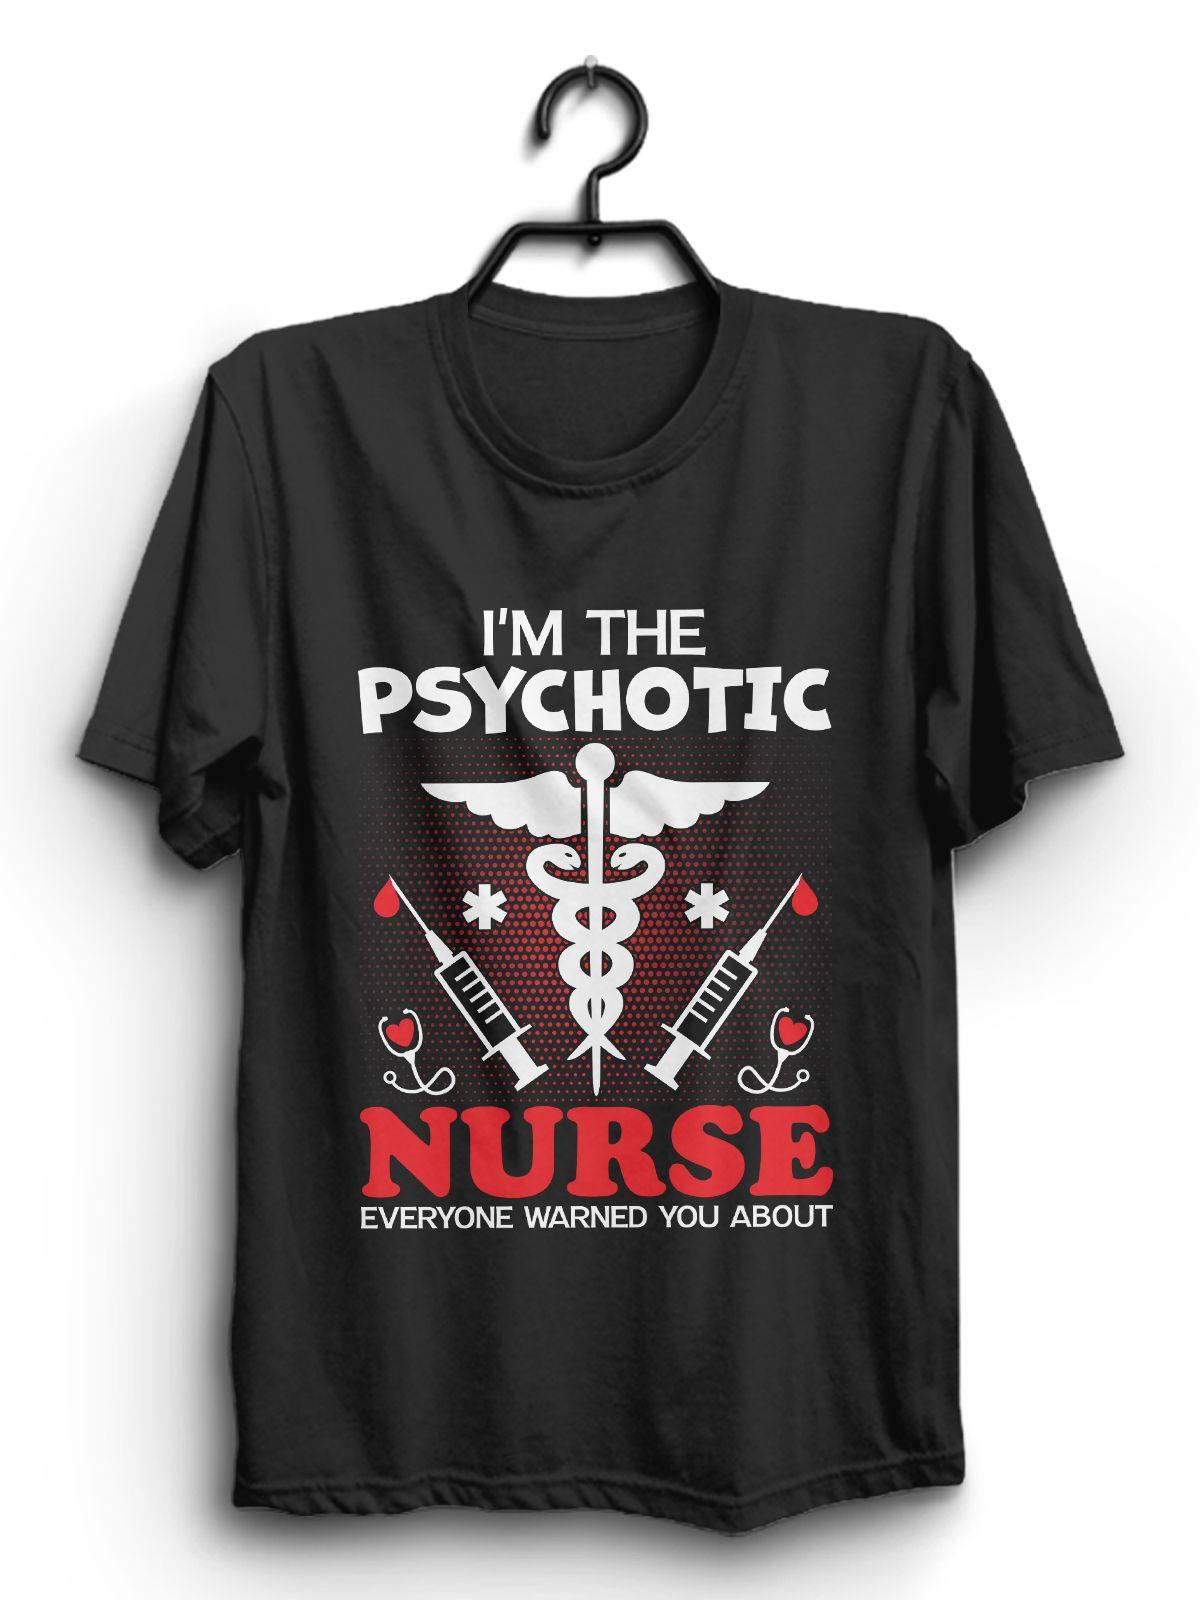 Funny Nurse T Shirt Relax My Mom Is A Nurse Er Male Nursing School Student Graduation Tee Tshirt Gift For Men Boyfriend Presents Birthday